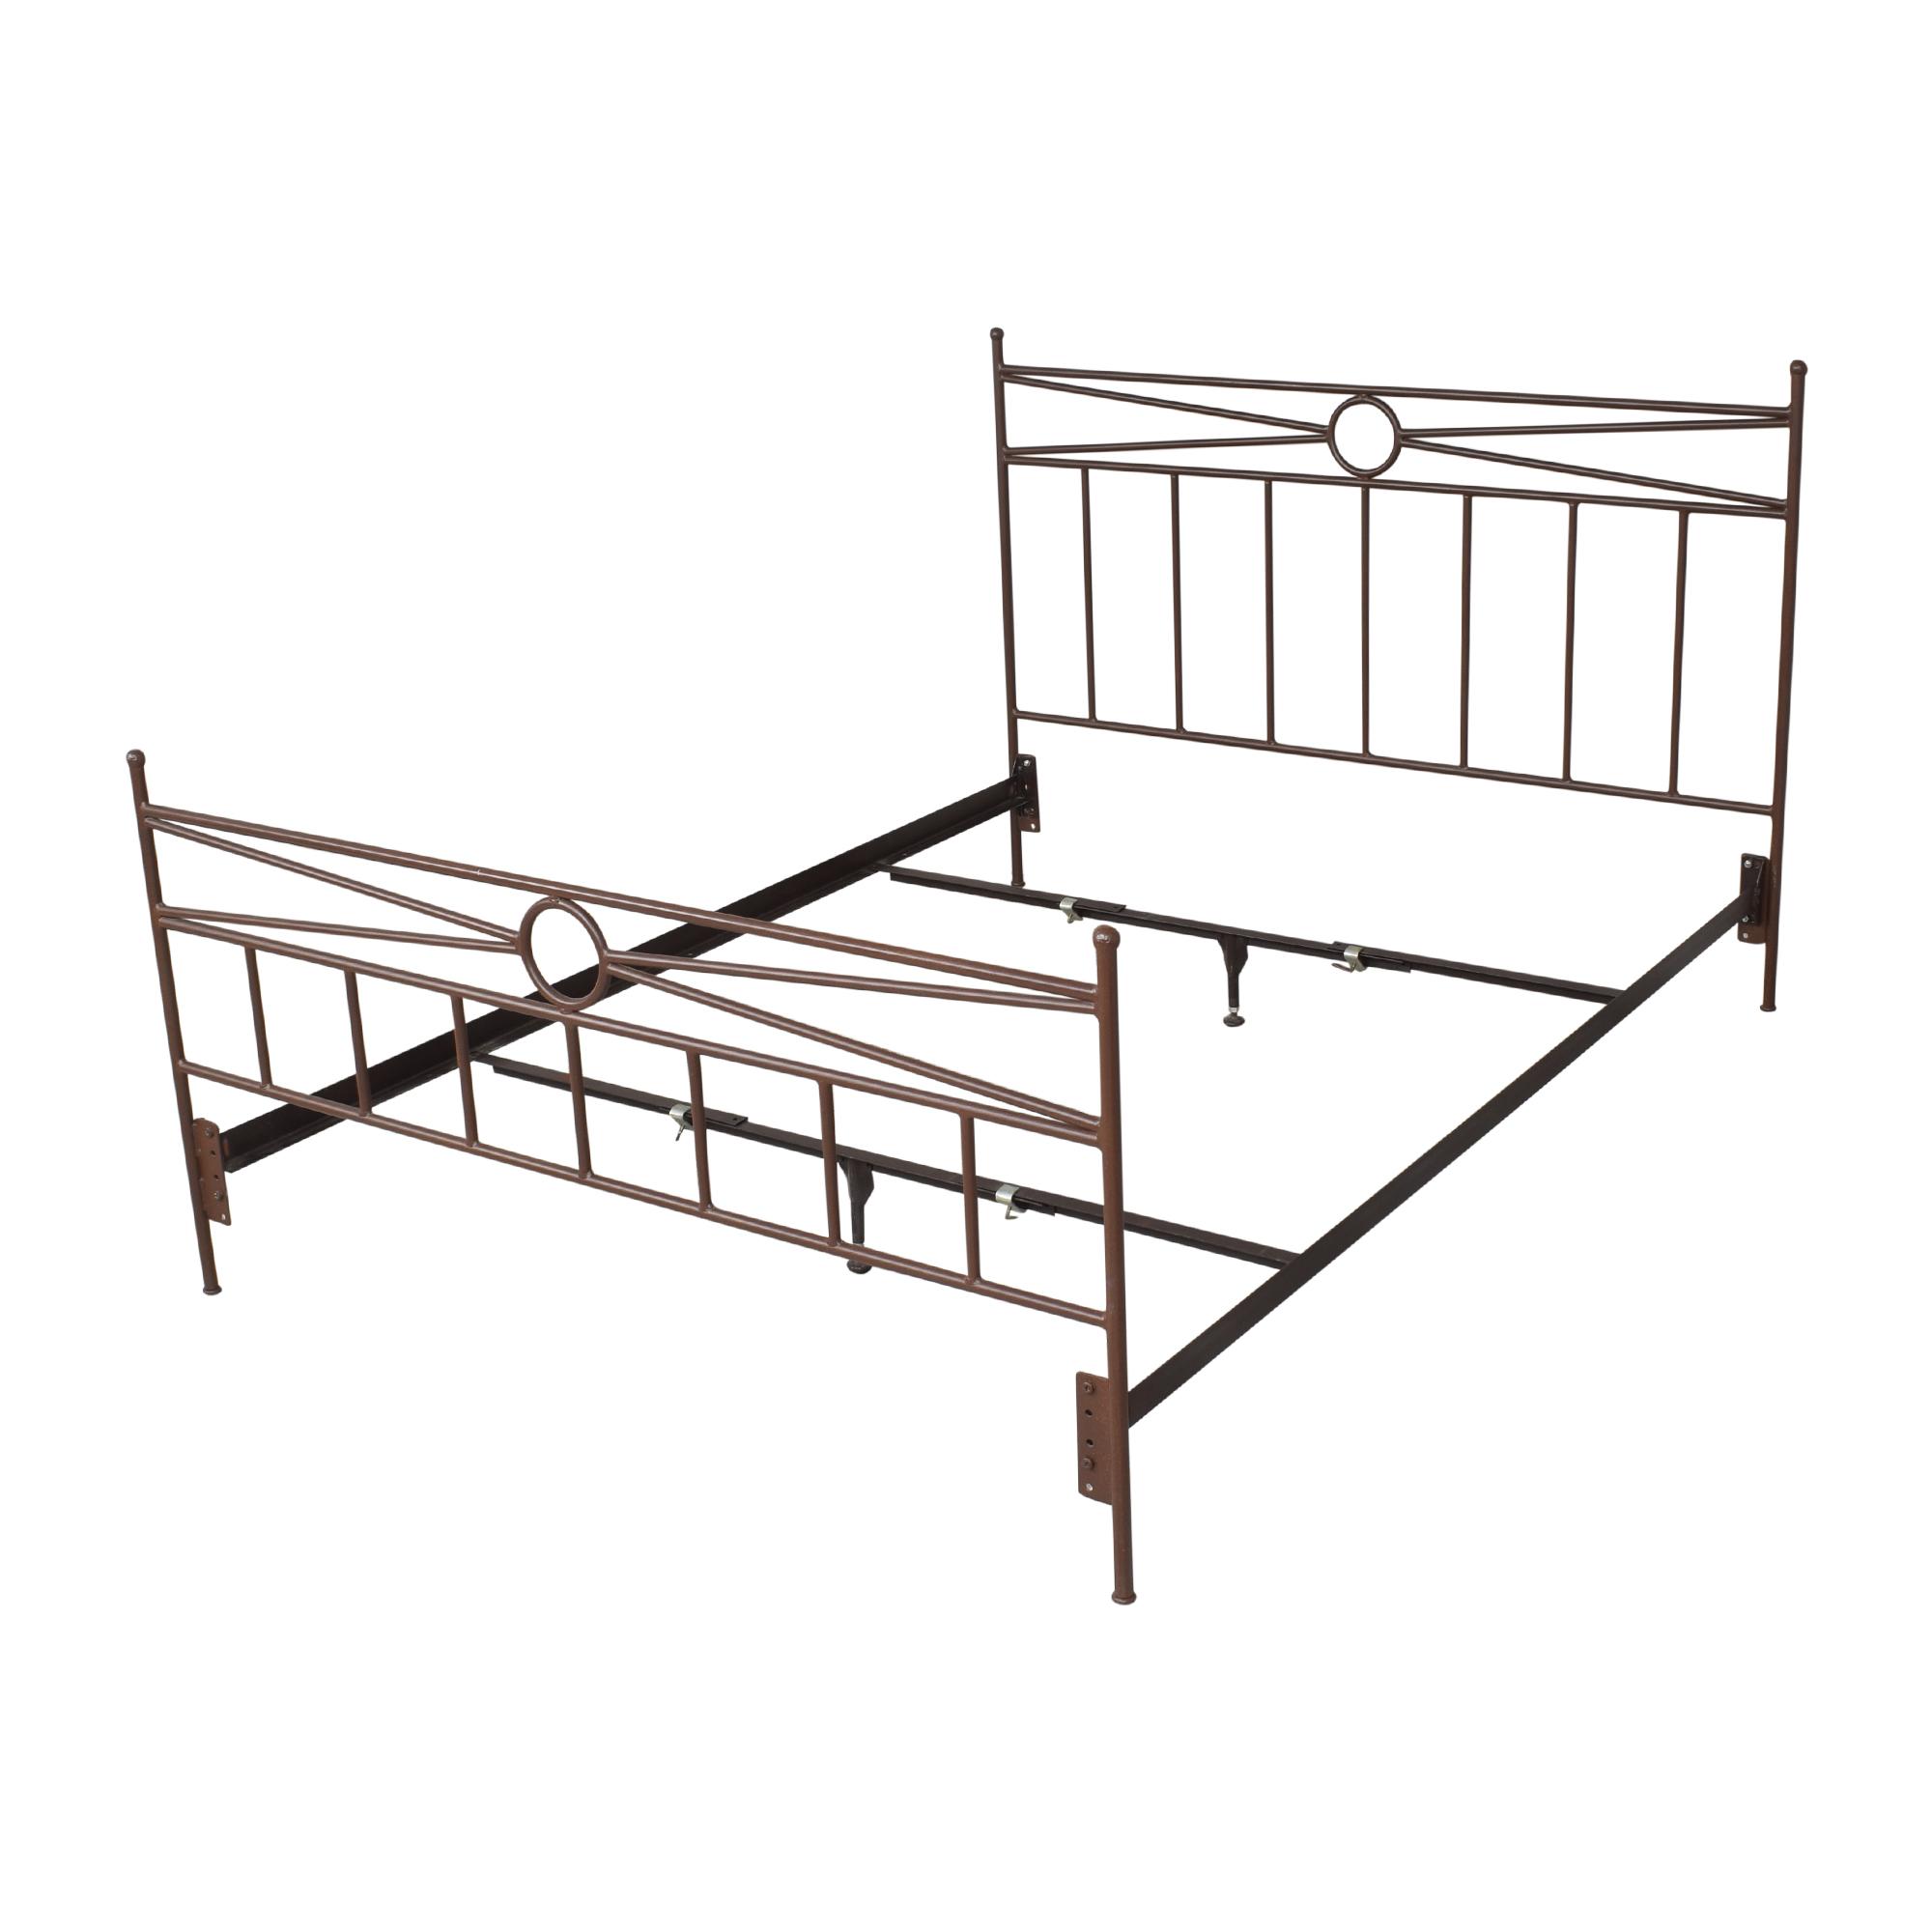 Ballard Designs Ballard Designs Modern Queen Bed price